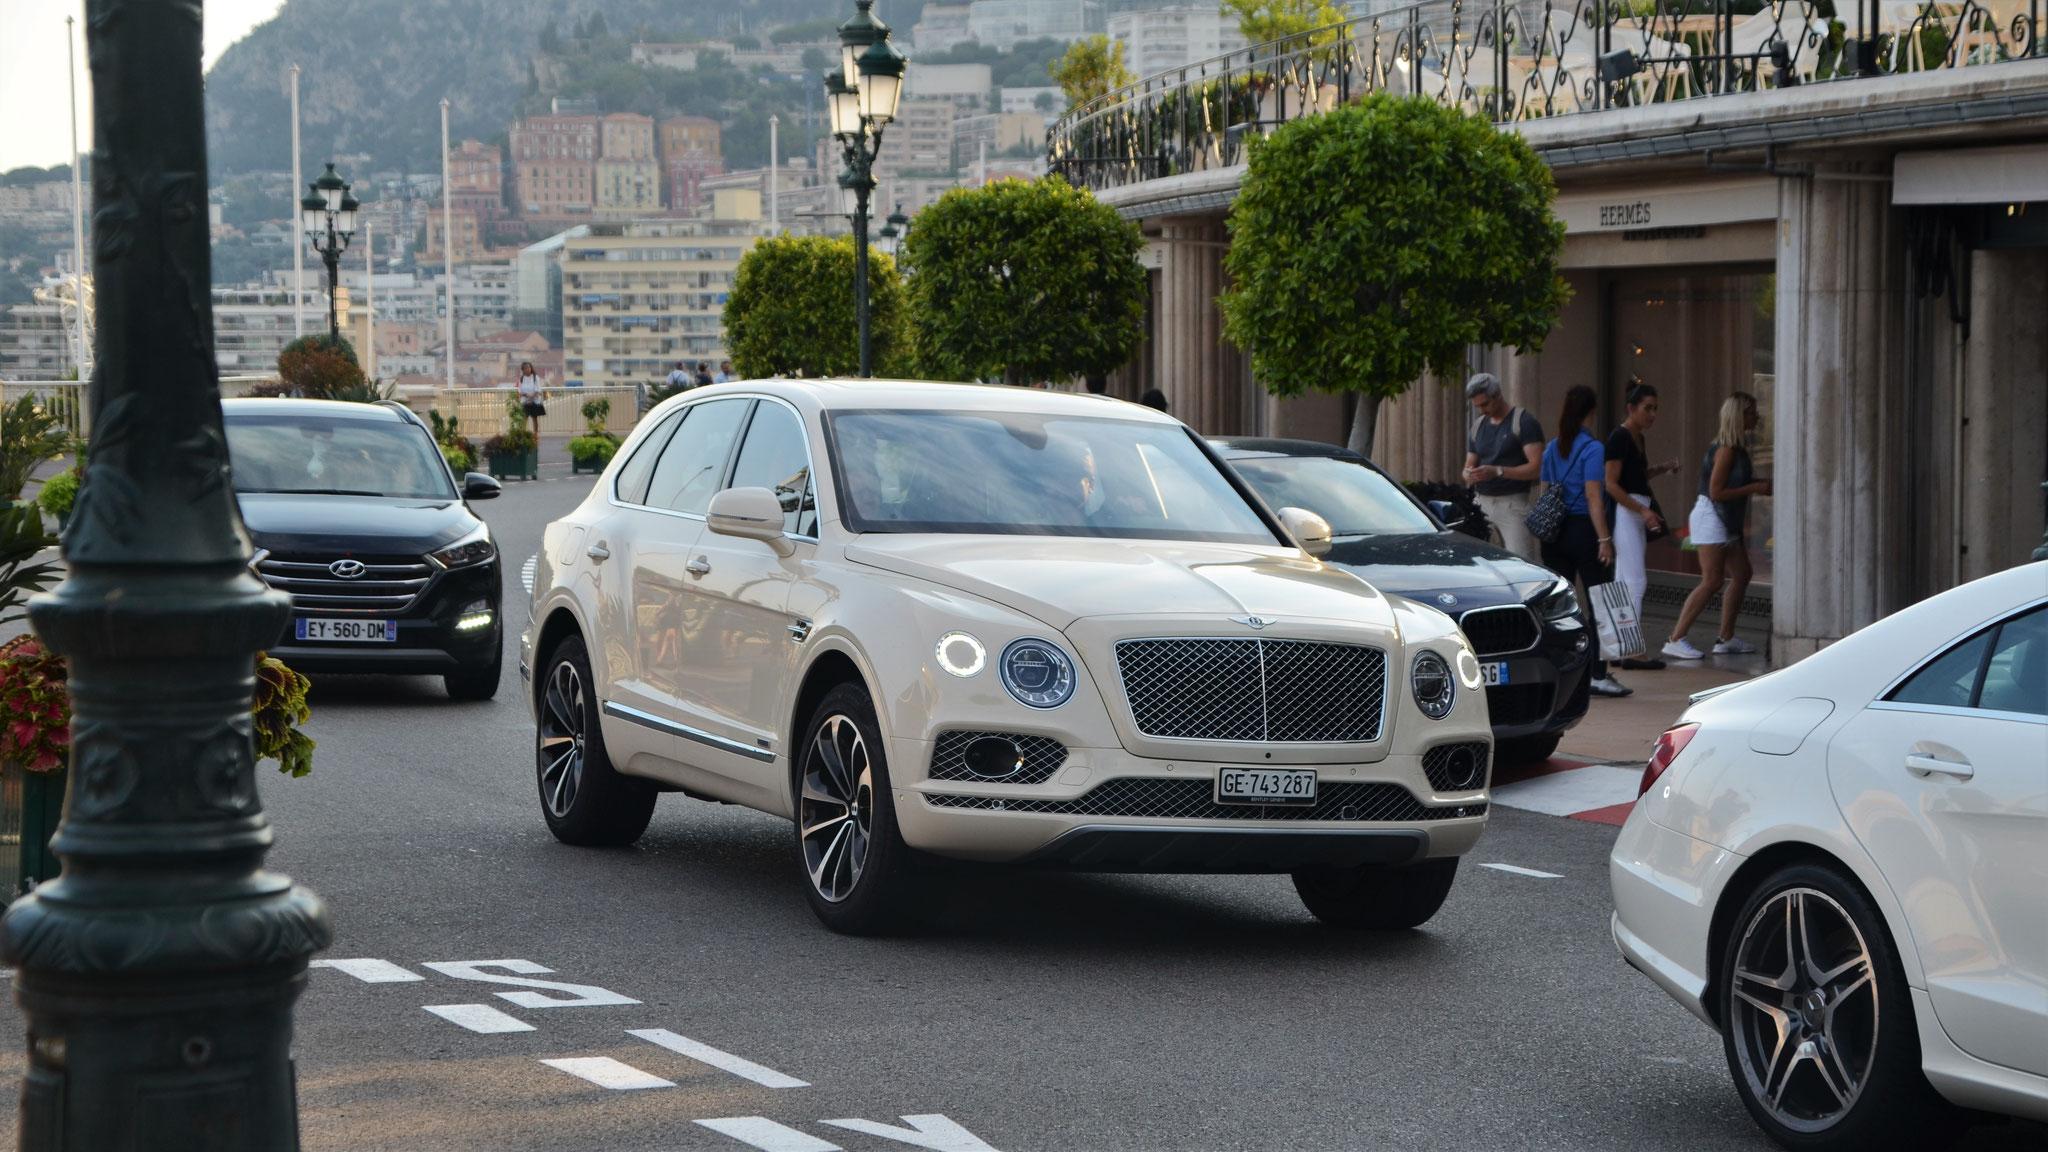 Bentley Bentayga - GE-743287 (CH)